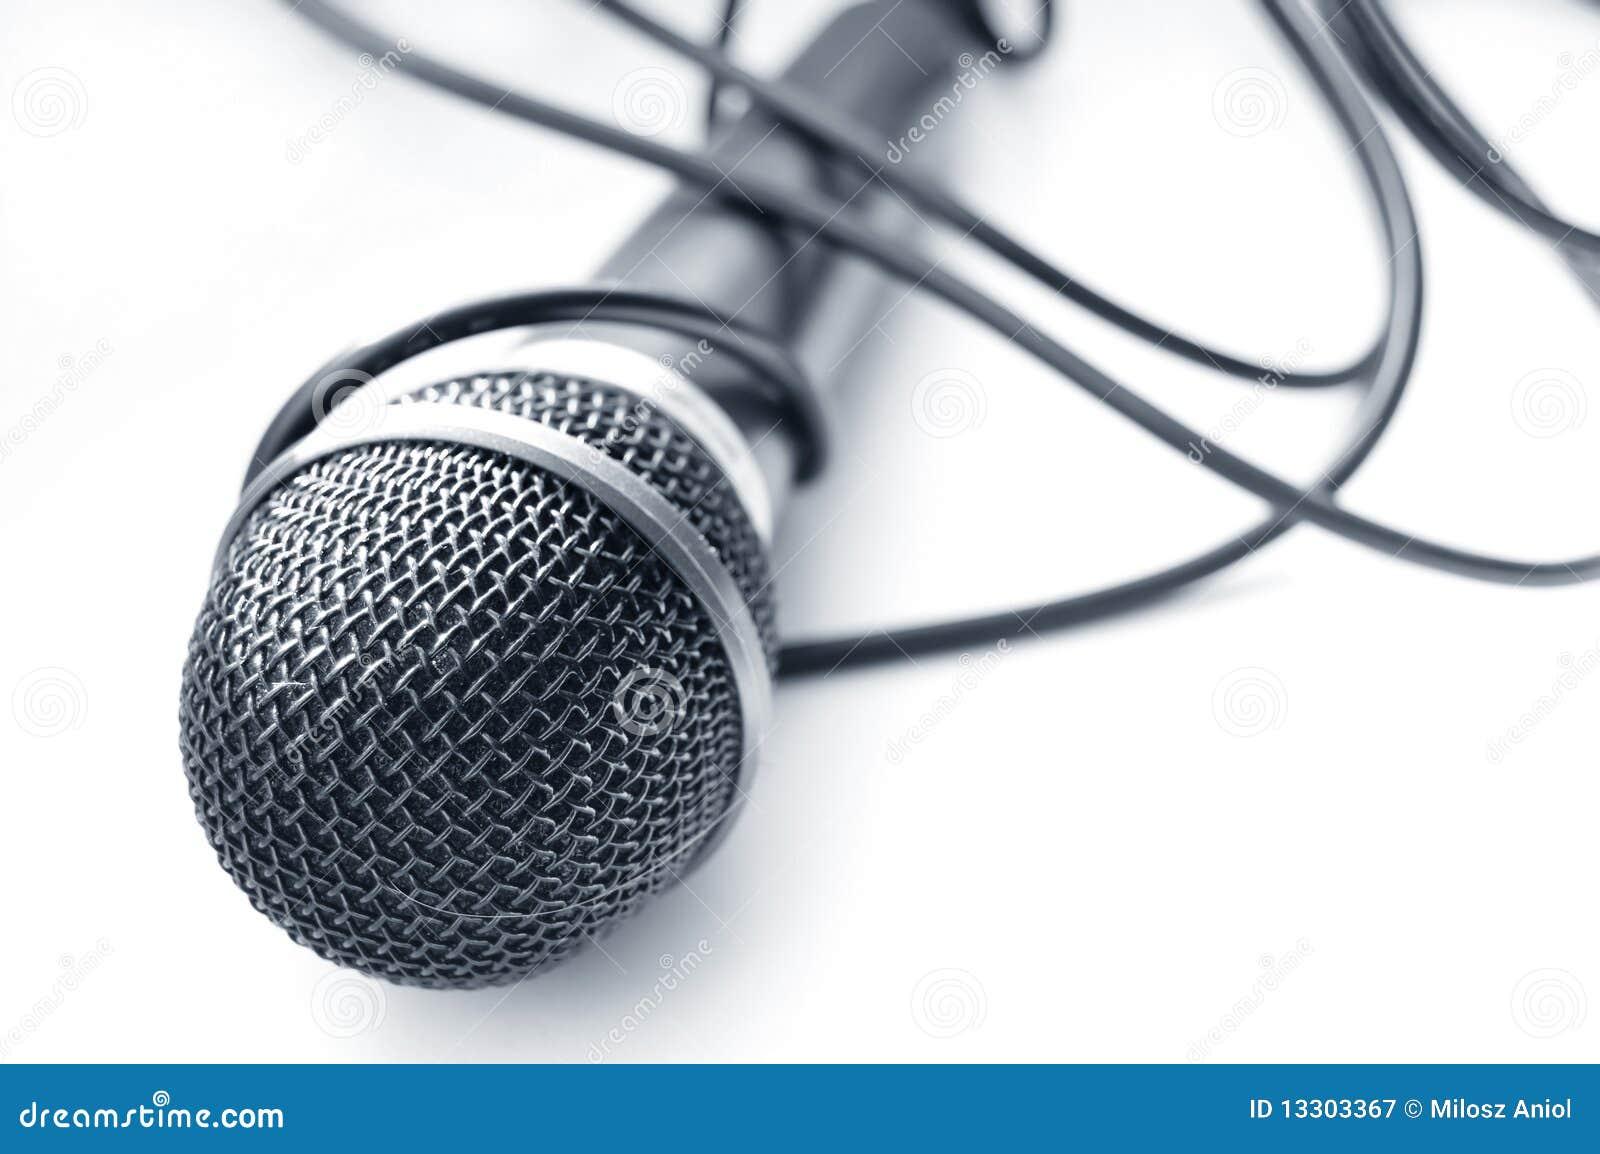 Microphone conceptual image.